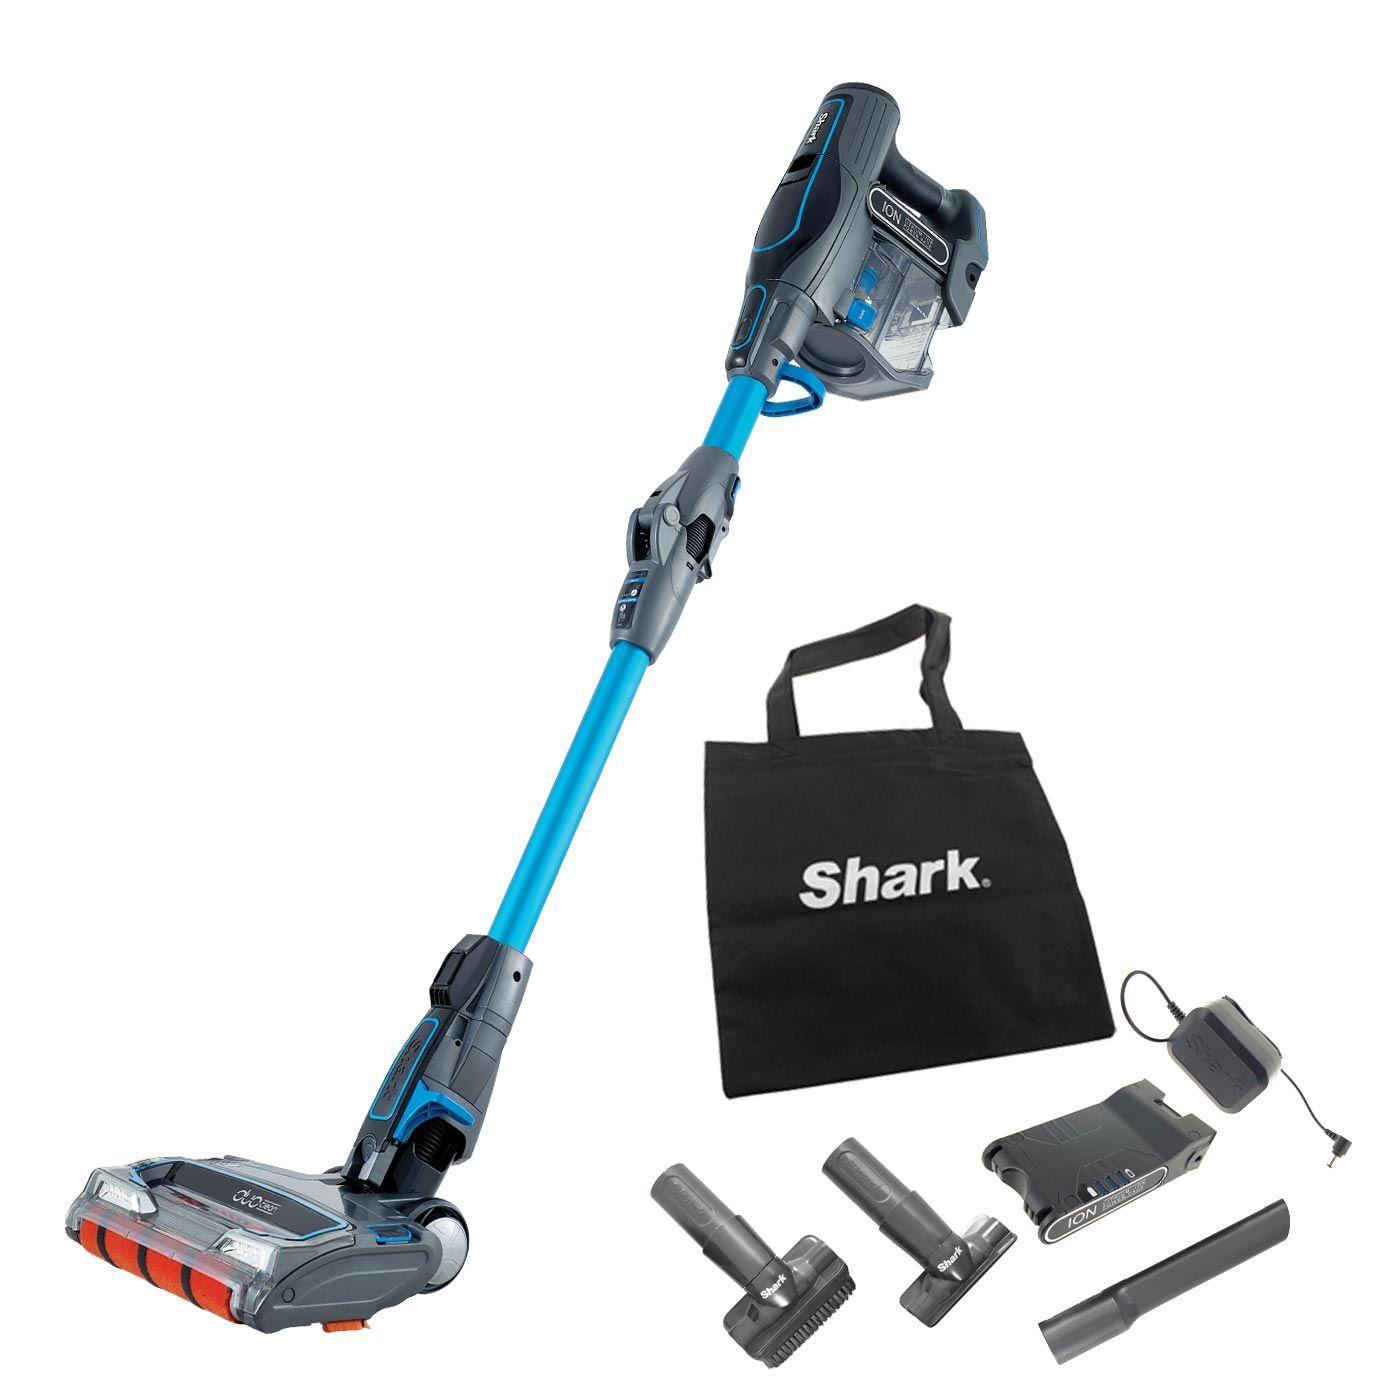 Shark Duoclean Cordless Vacuum Cleaner With Flexology If200uk Kabelloser Staubsauger Bodenstaubsauger Handsauger